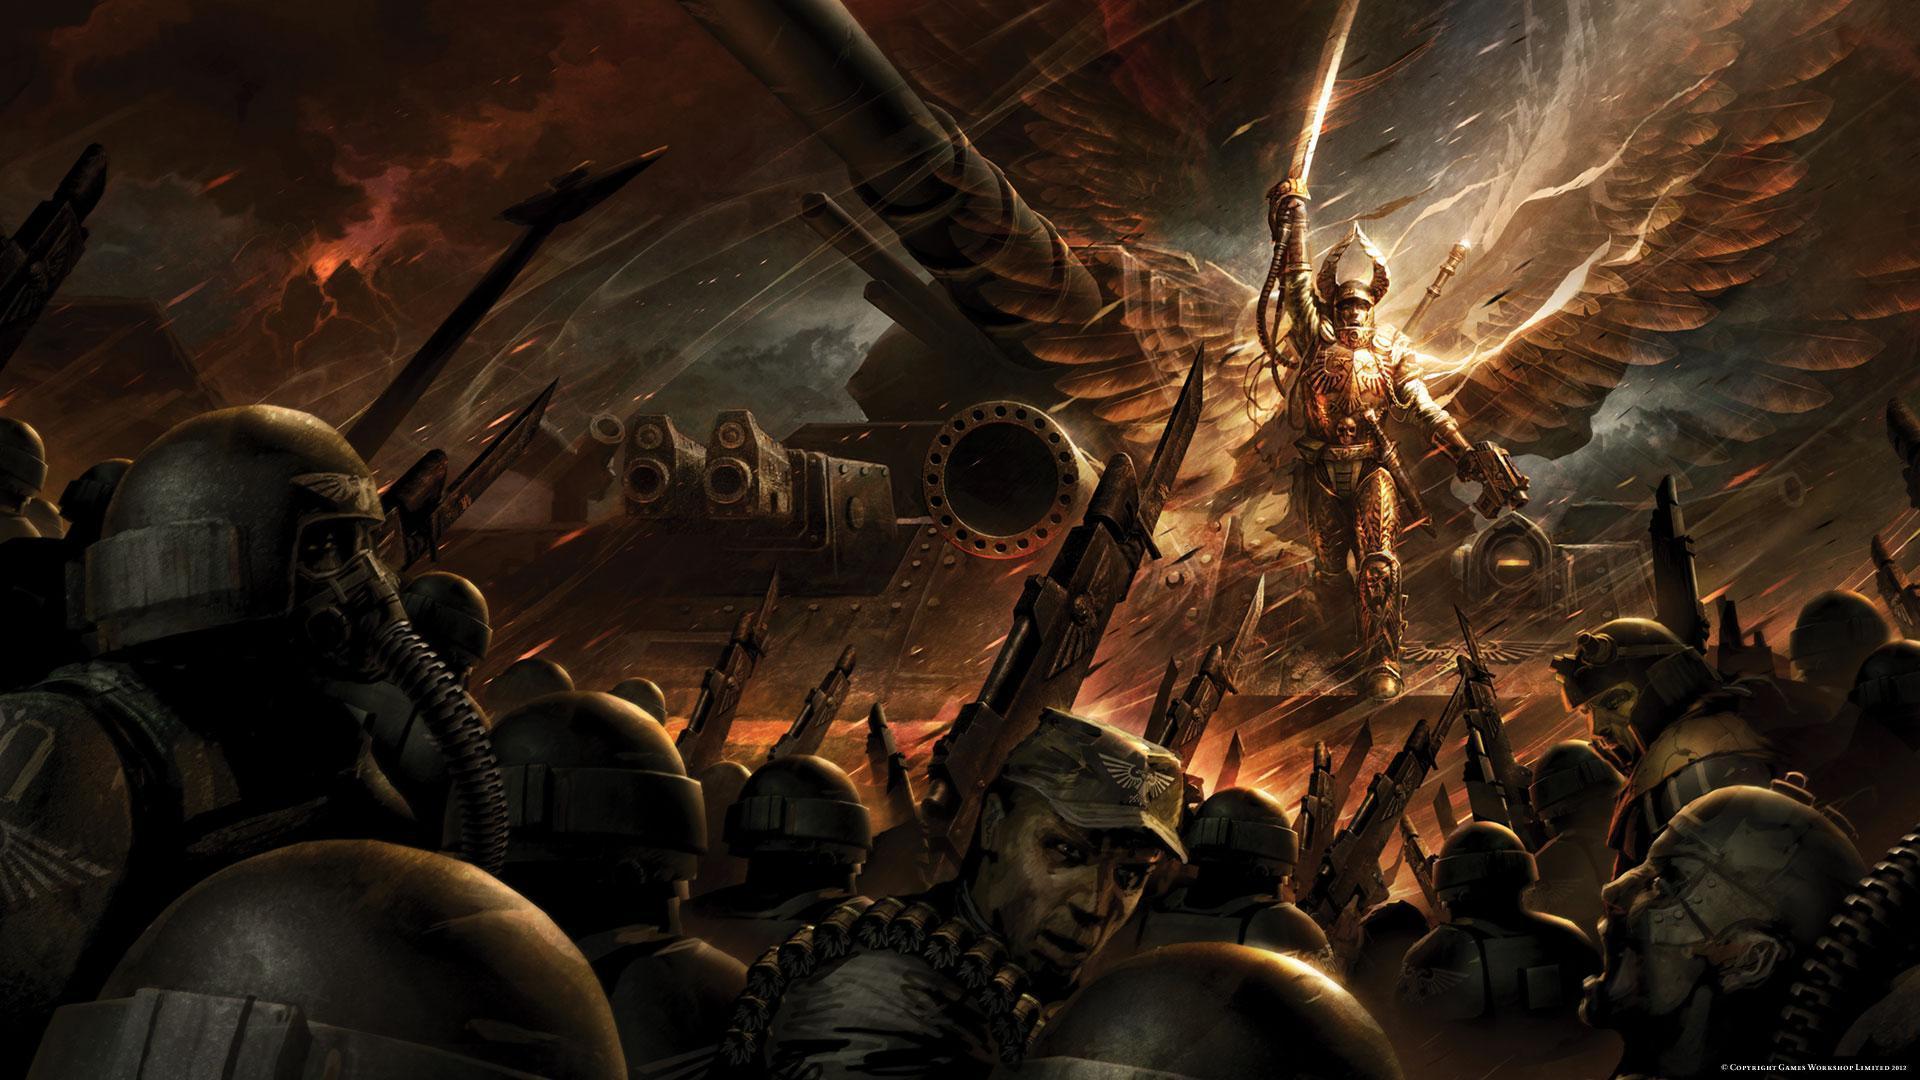 La Croisade Macharienne Tome 1 : l'Ange de Feu de William King 719040AngelofFire